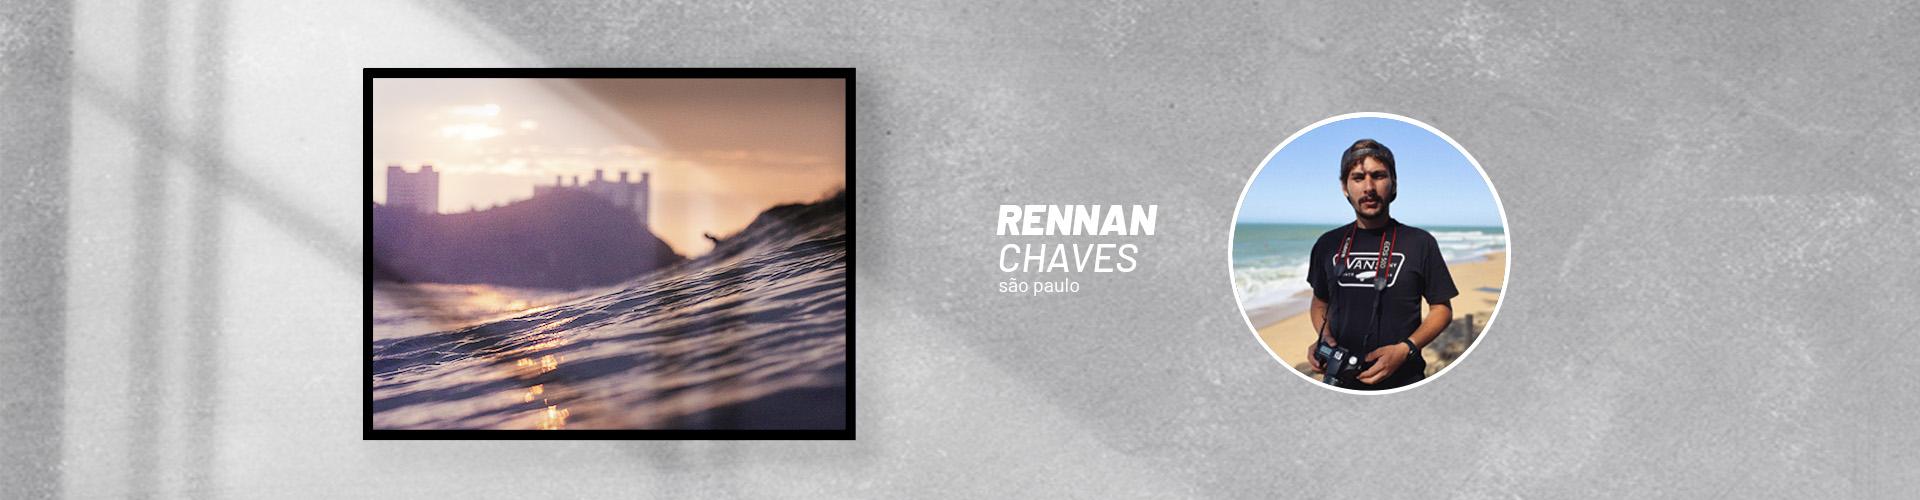 Página Artista | Rennan Chaves